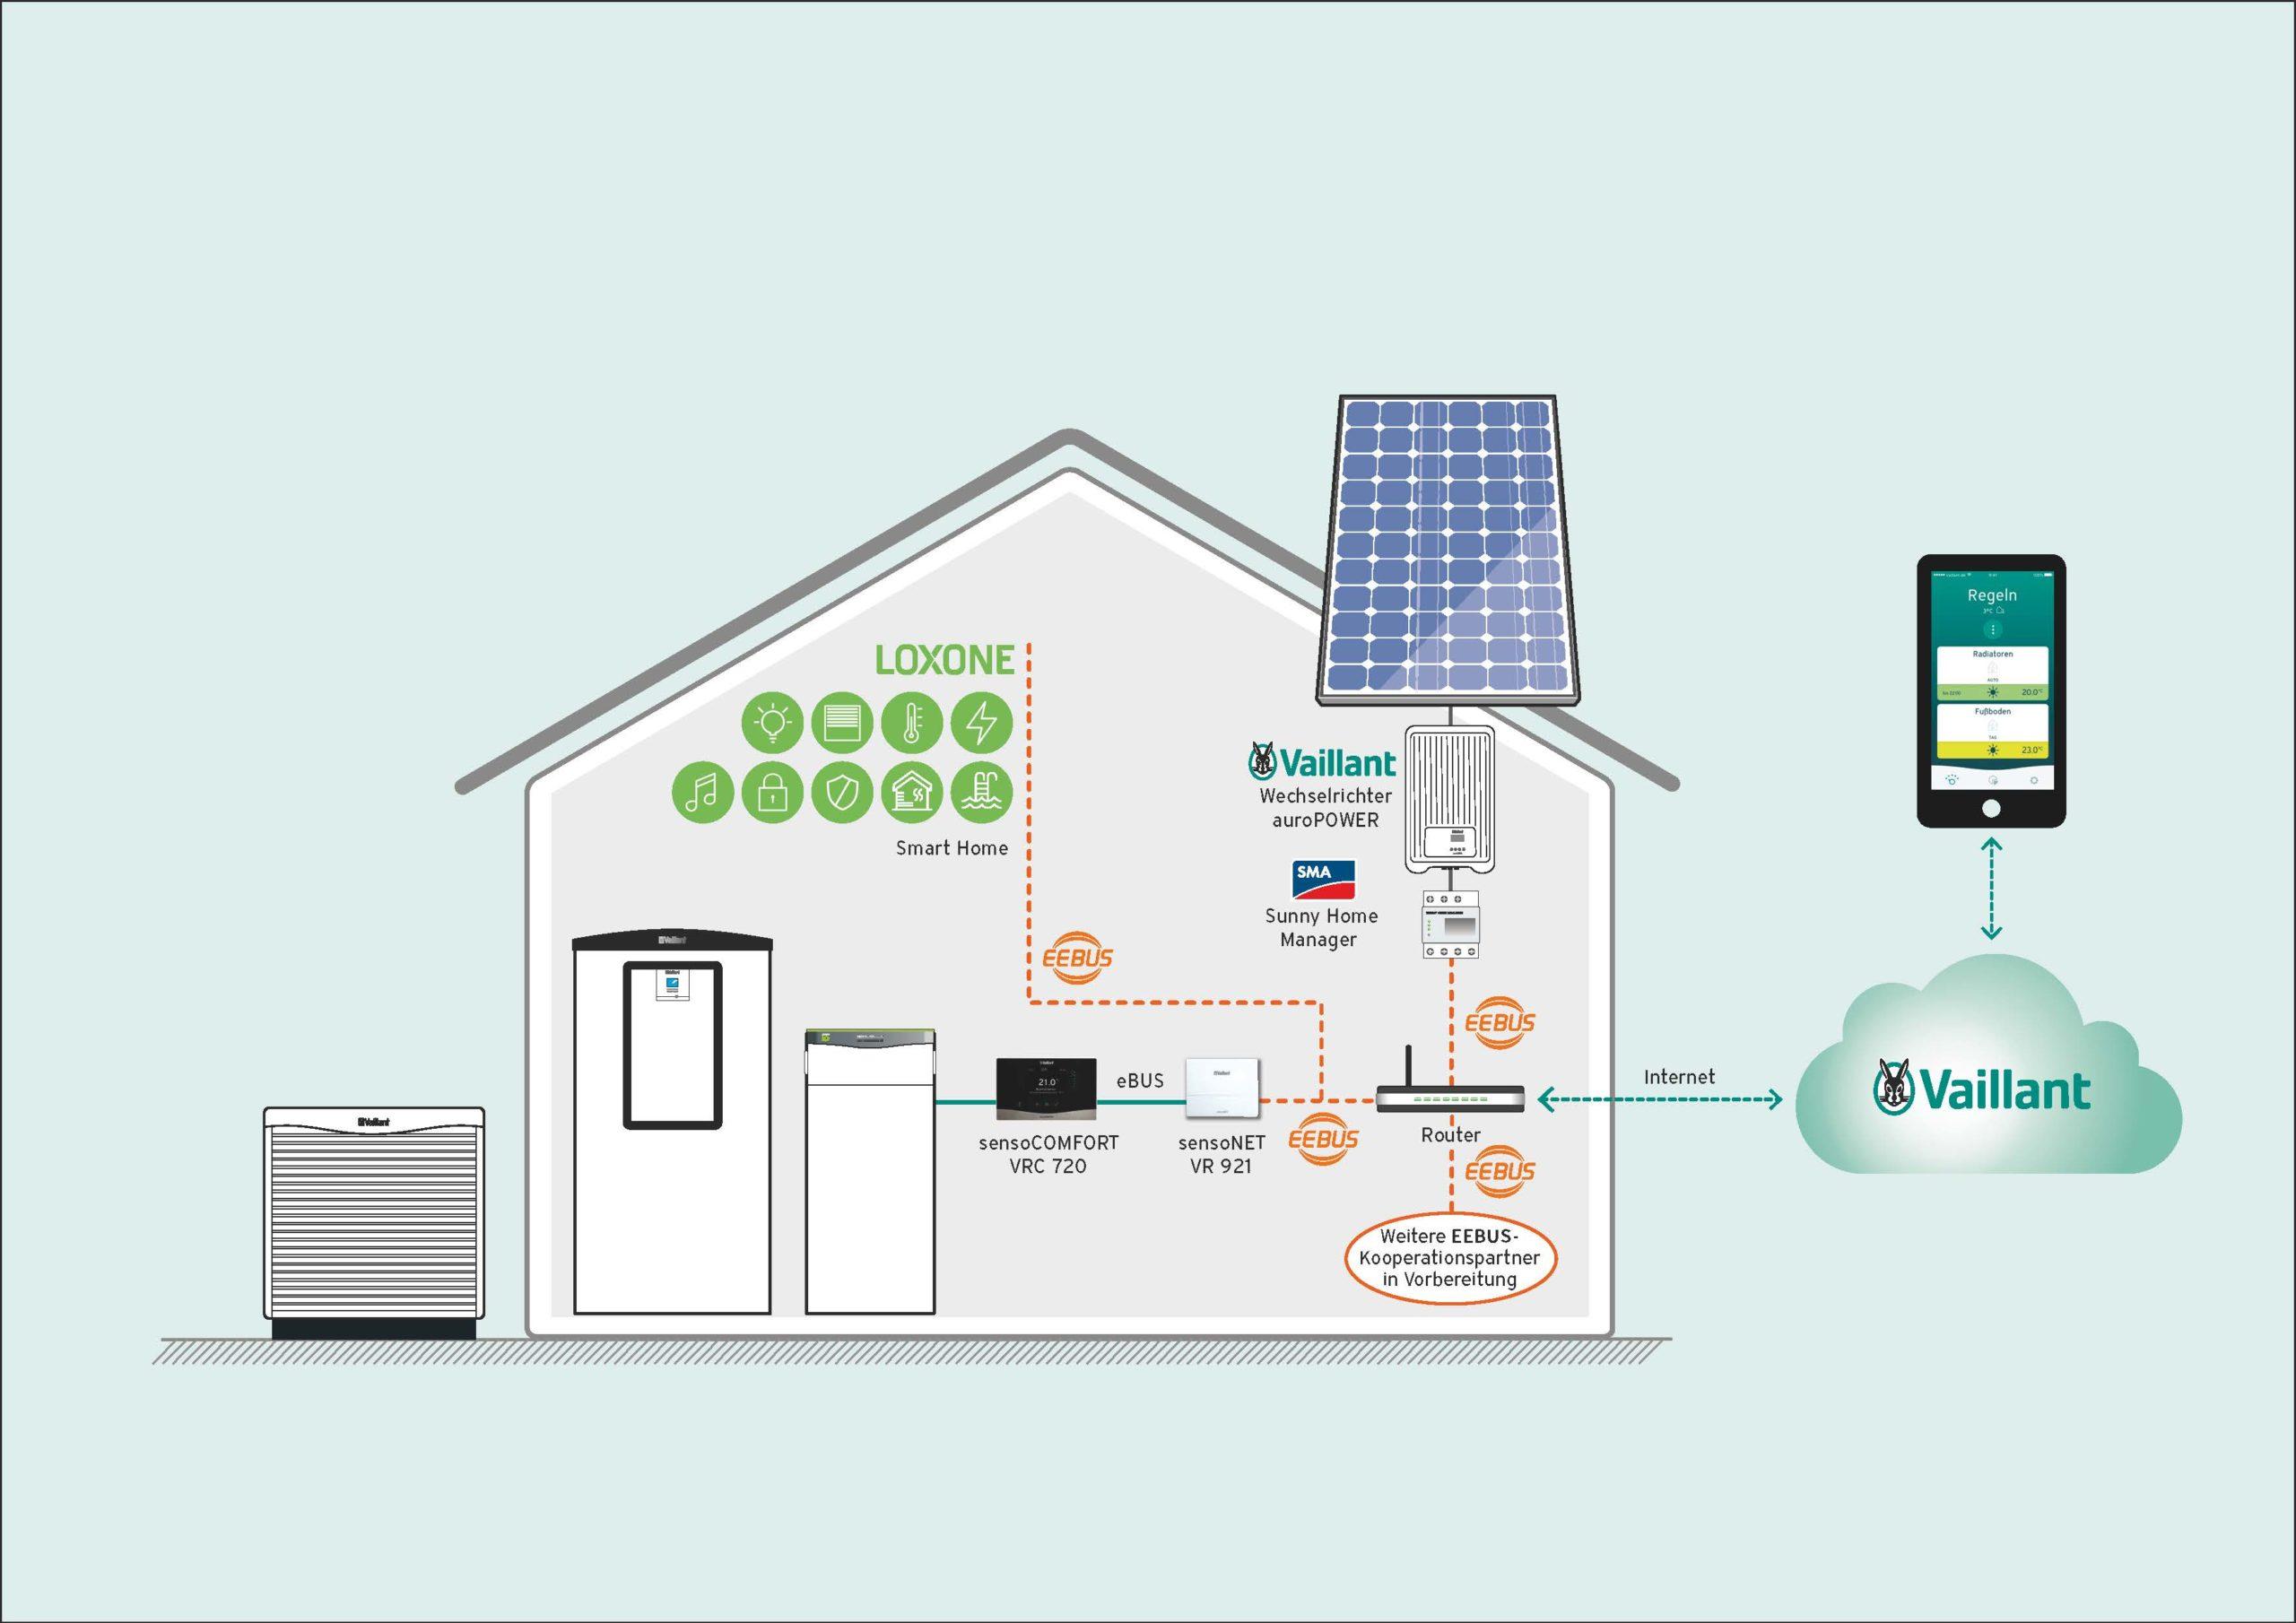 Systemhaus EEBUS Loxone Grafik